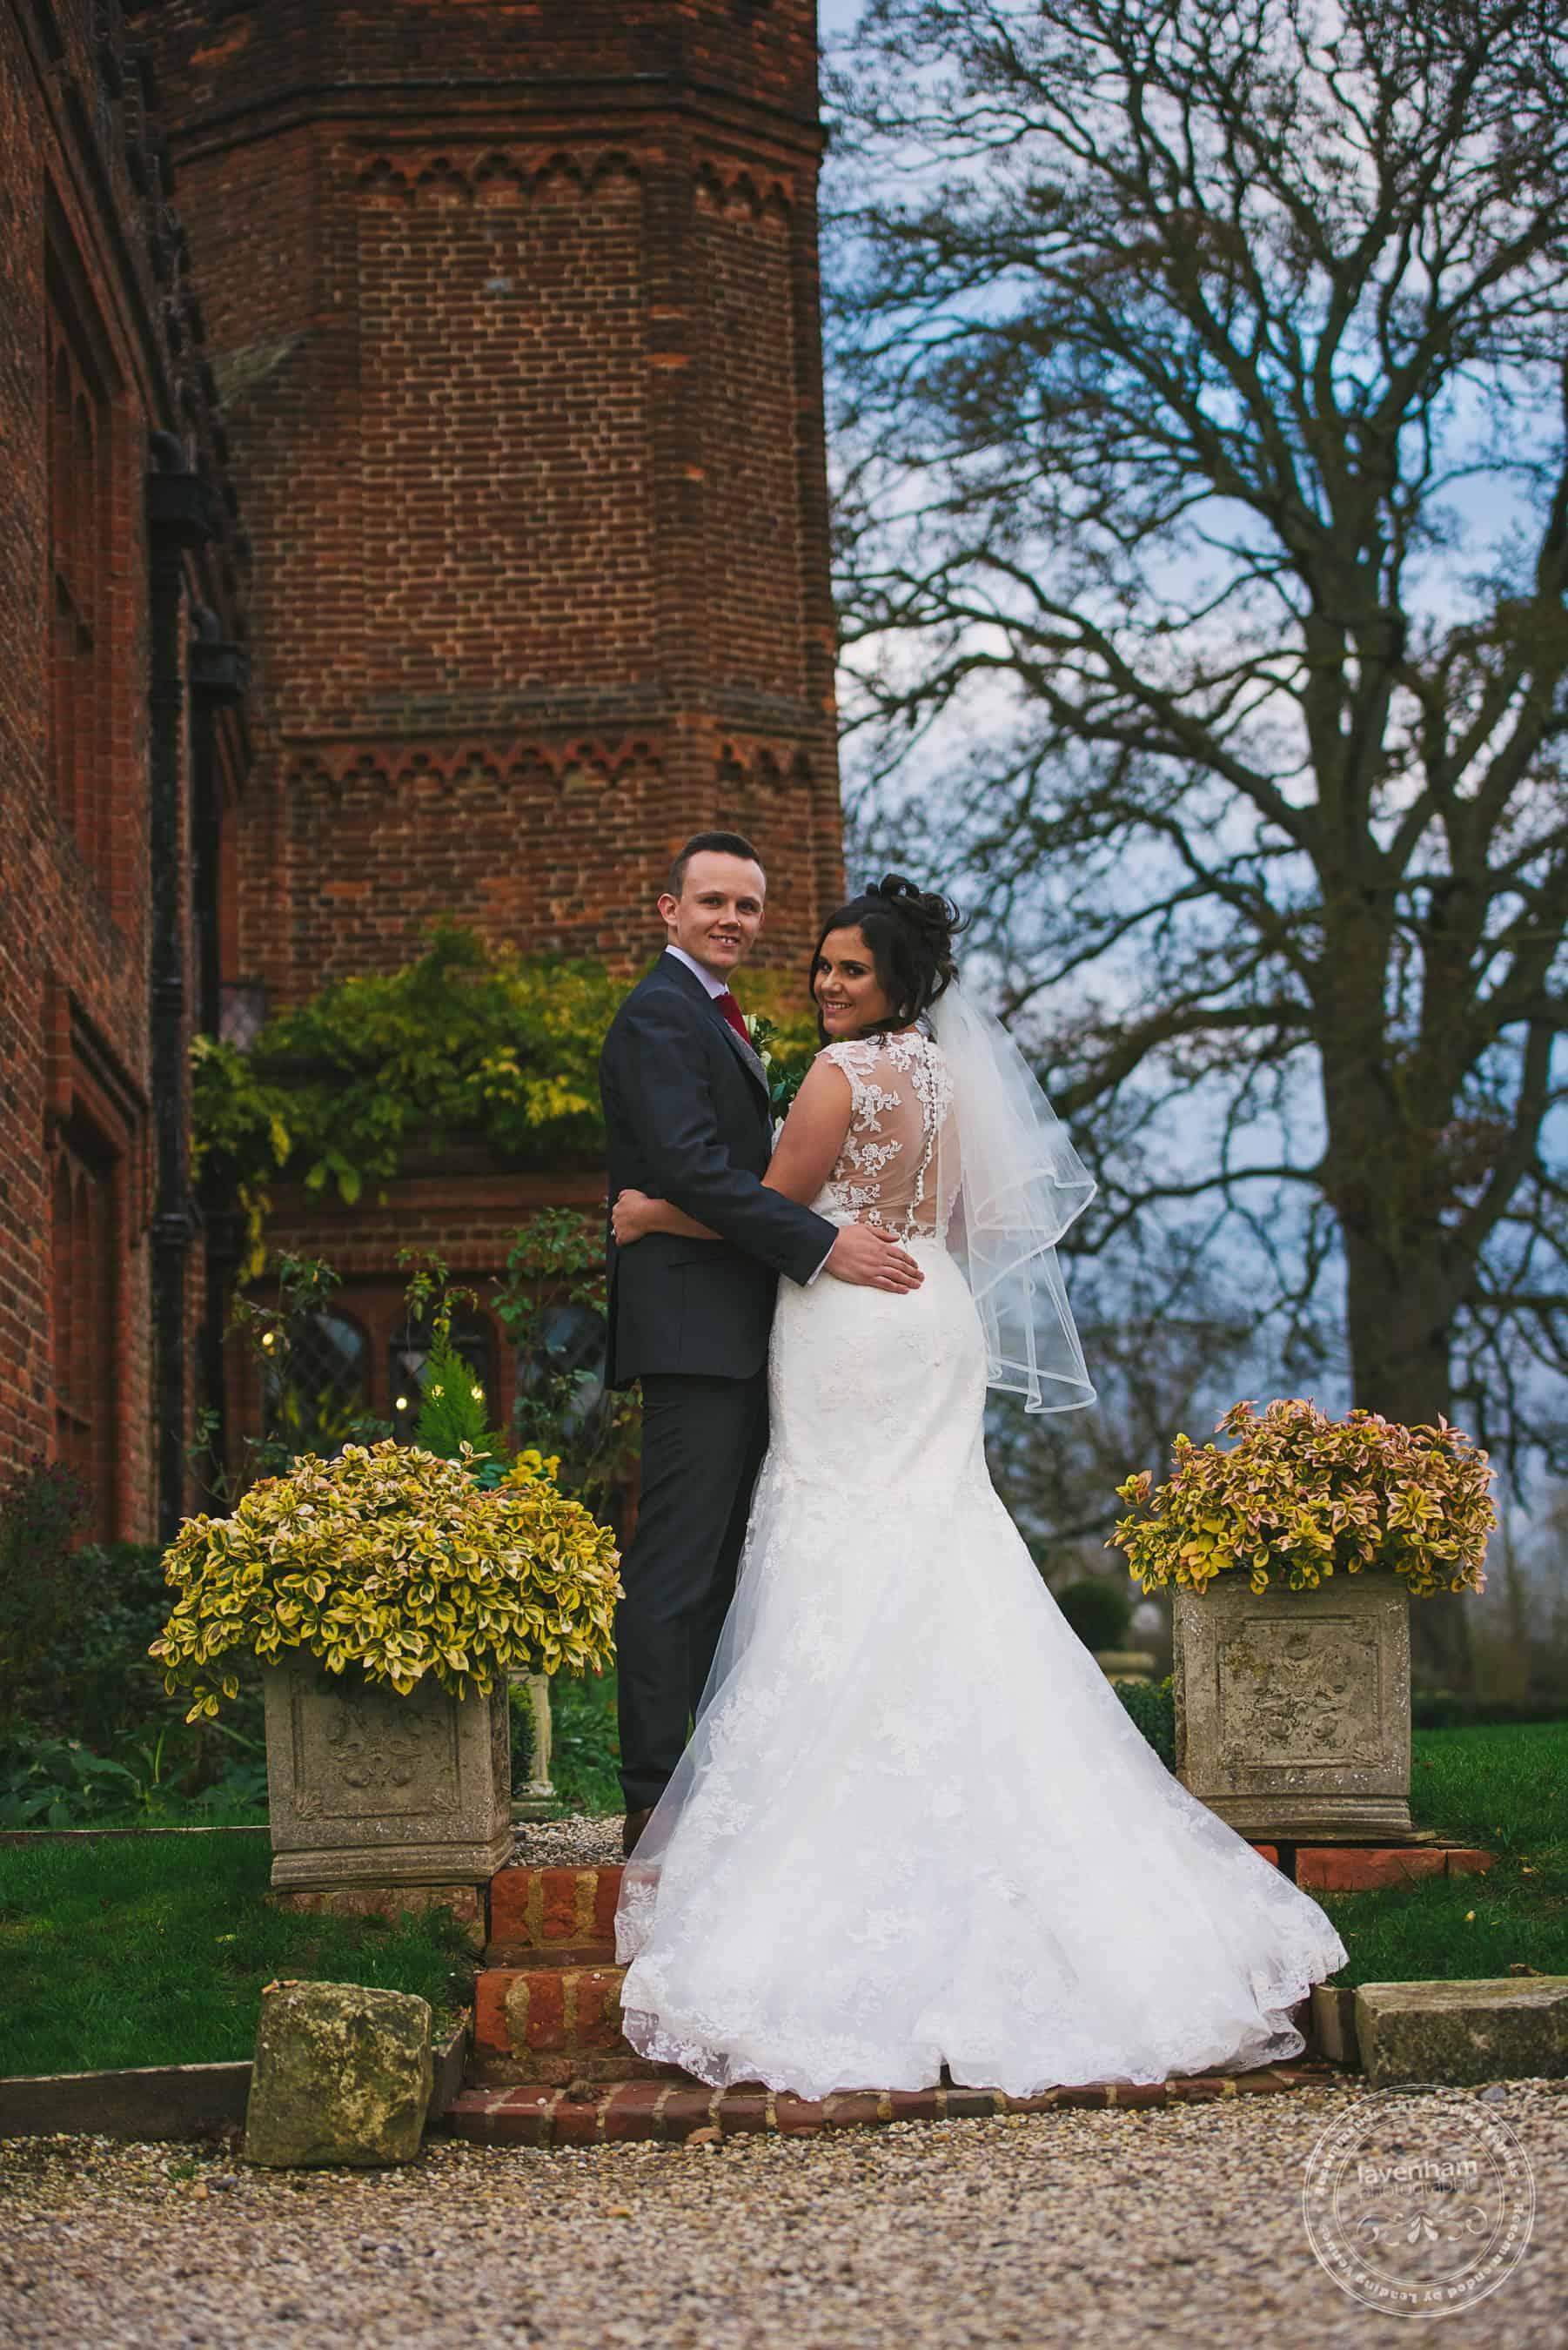 251118 Leez Priory Wedding Photography by Lavenham Photographic 095